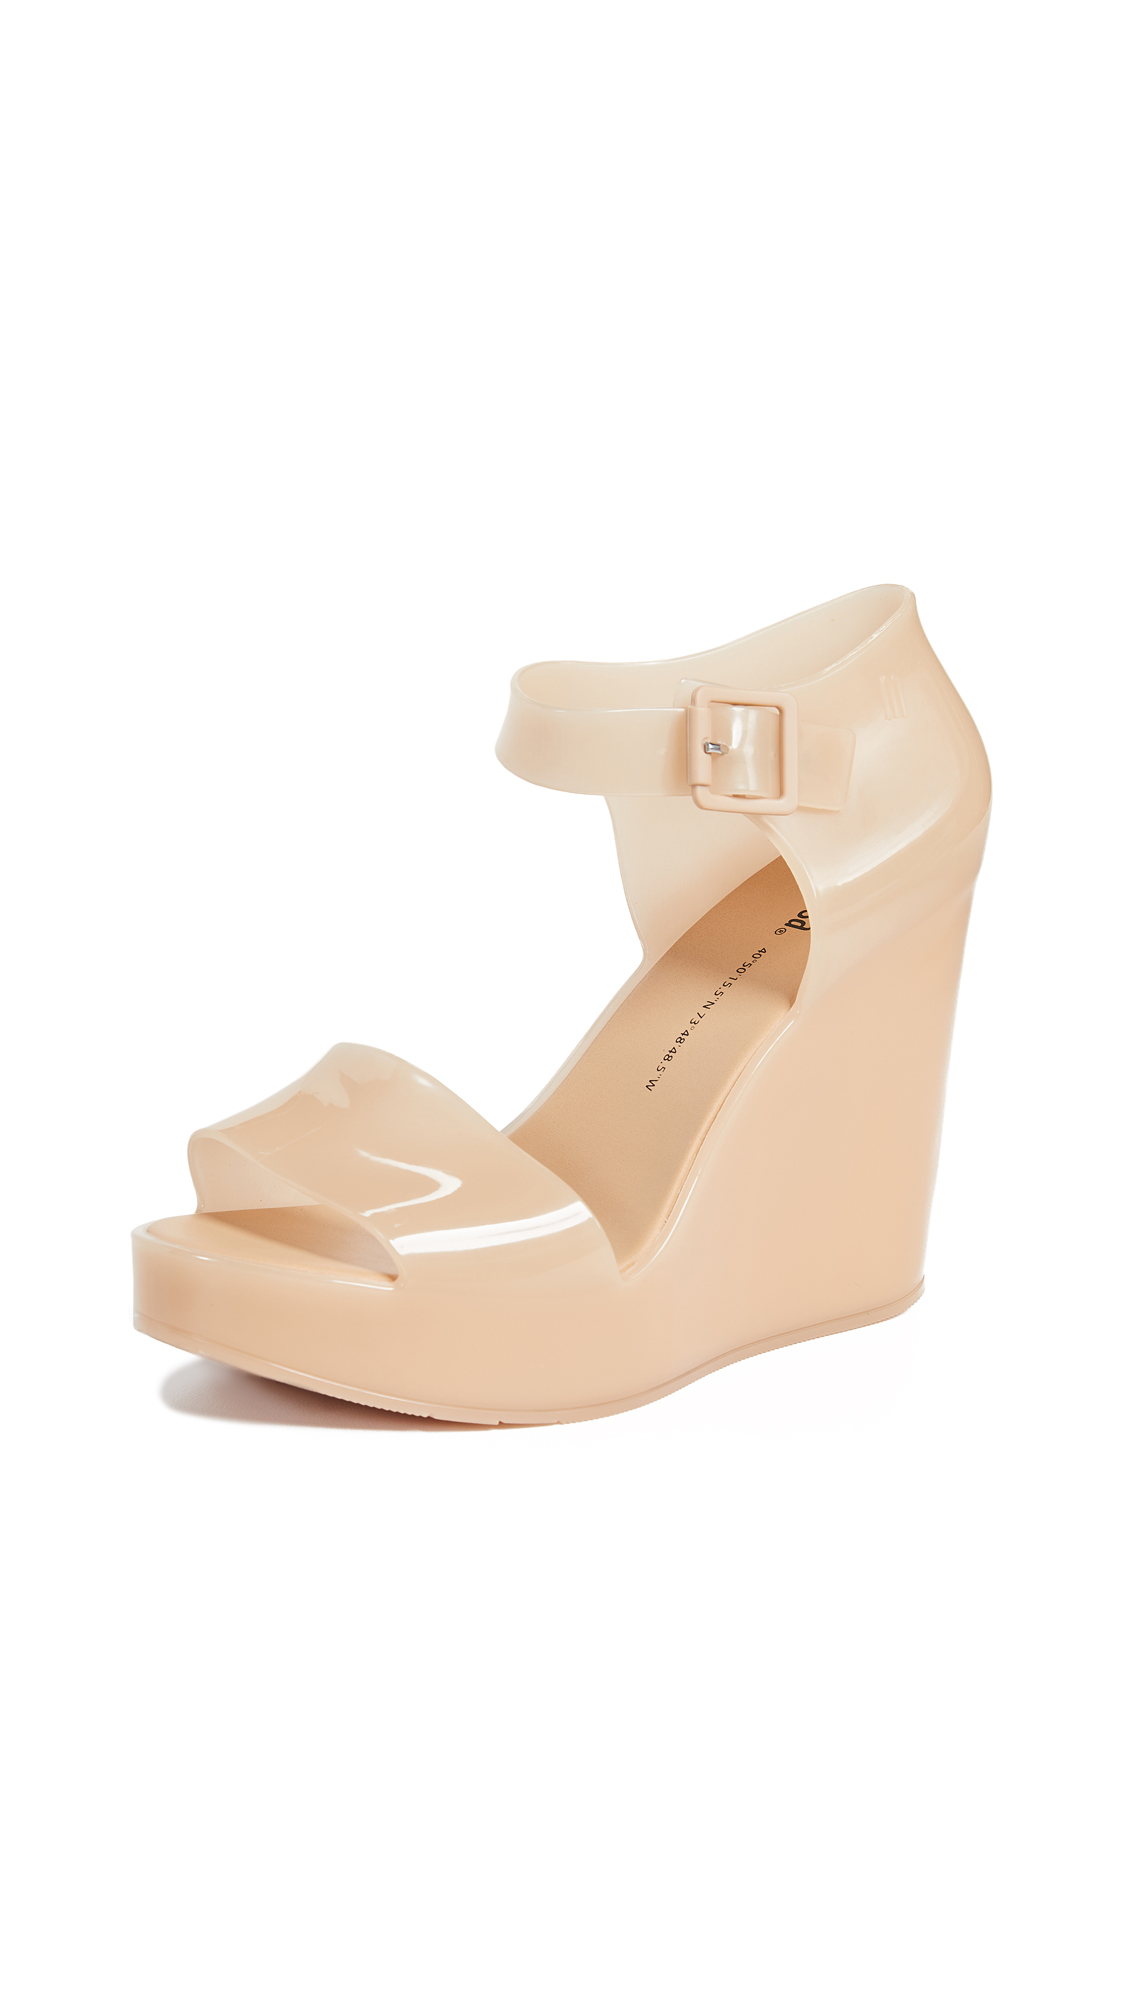 Melissa Mar Wedge Sandals - Beige Marzipan